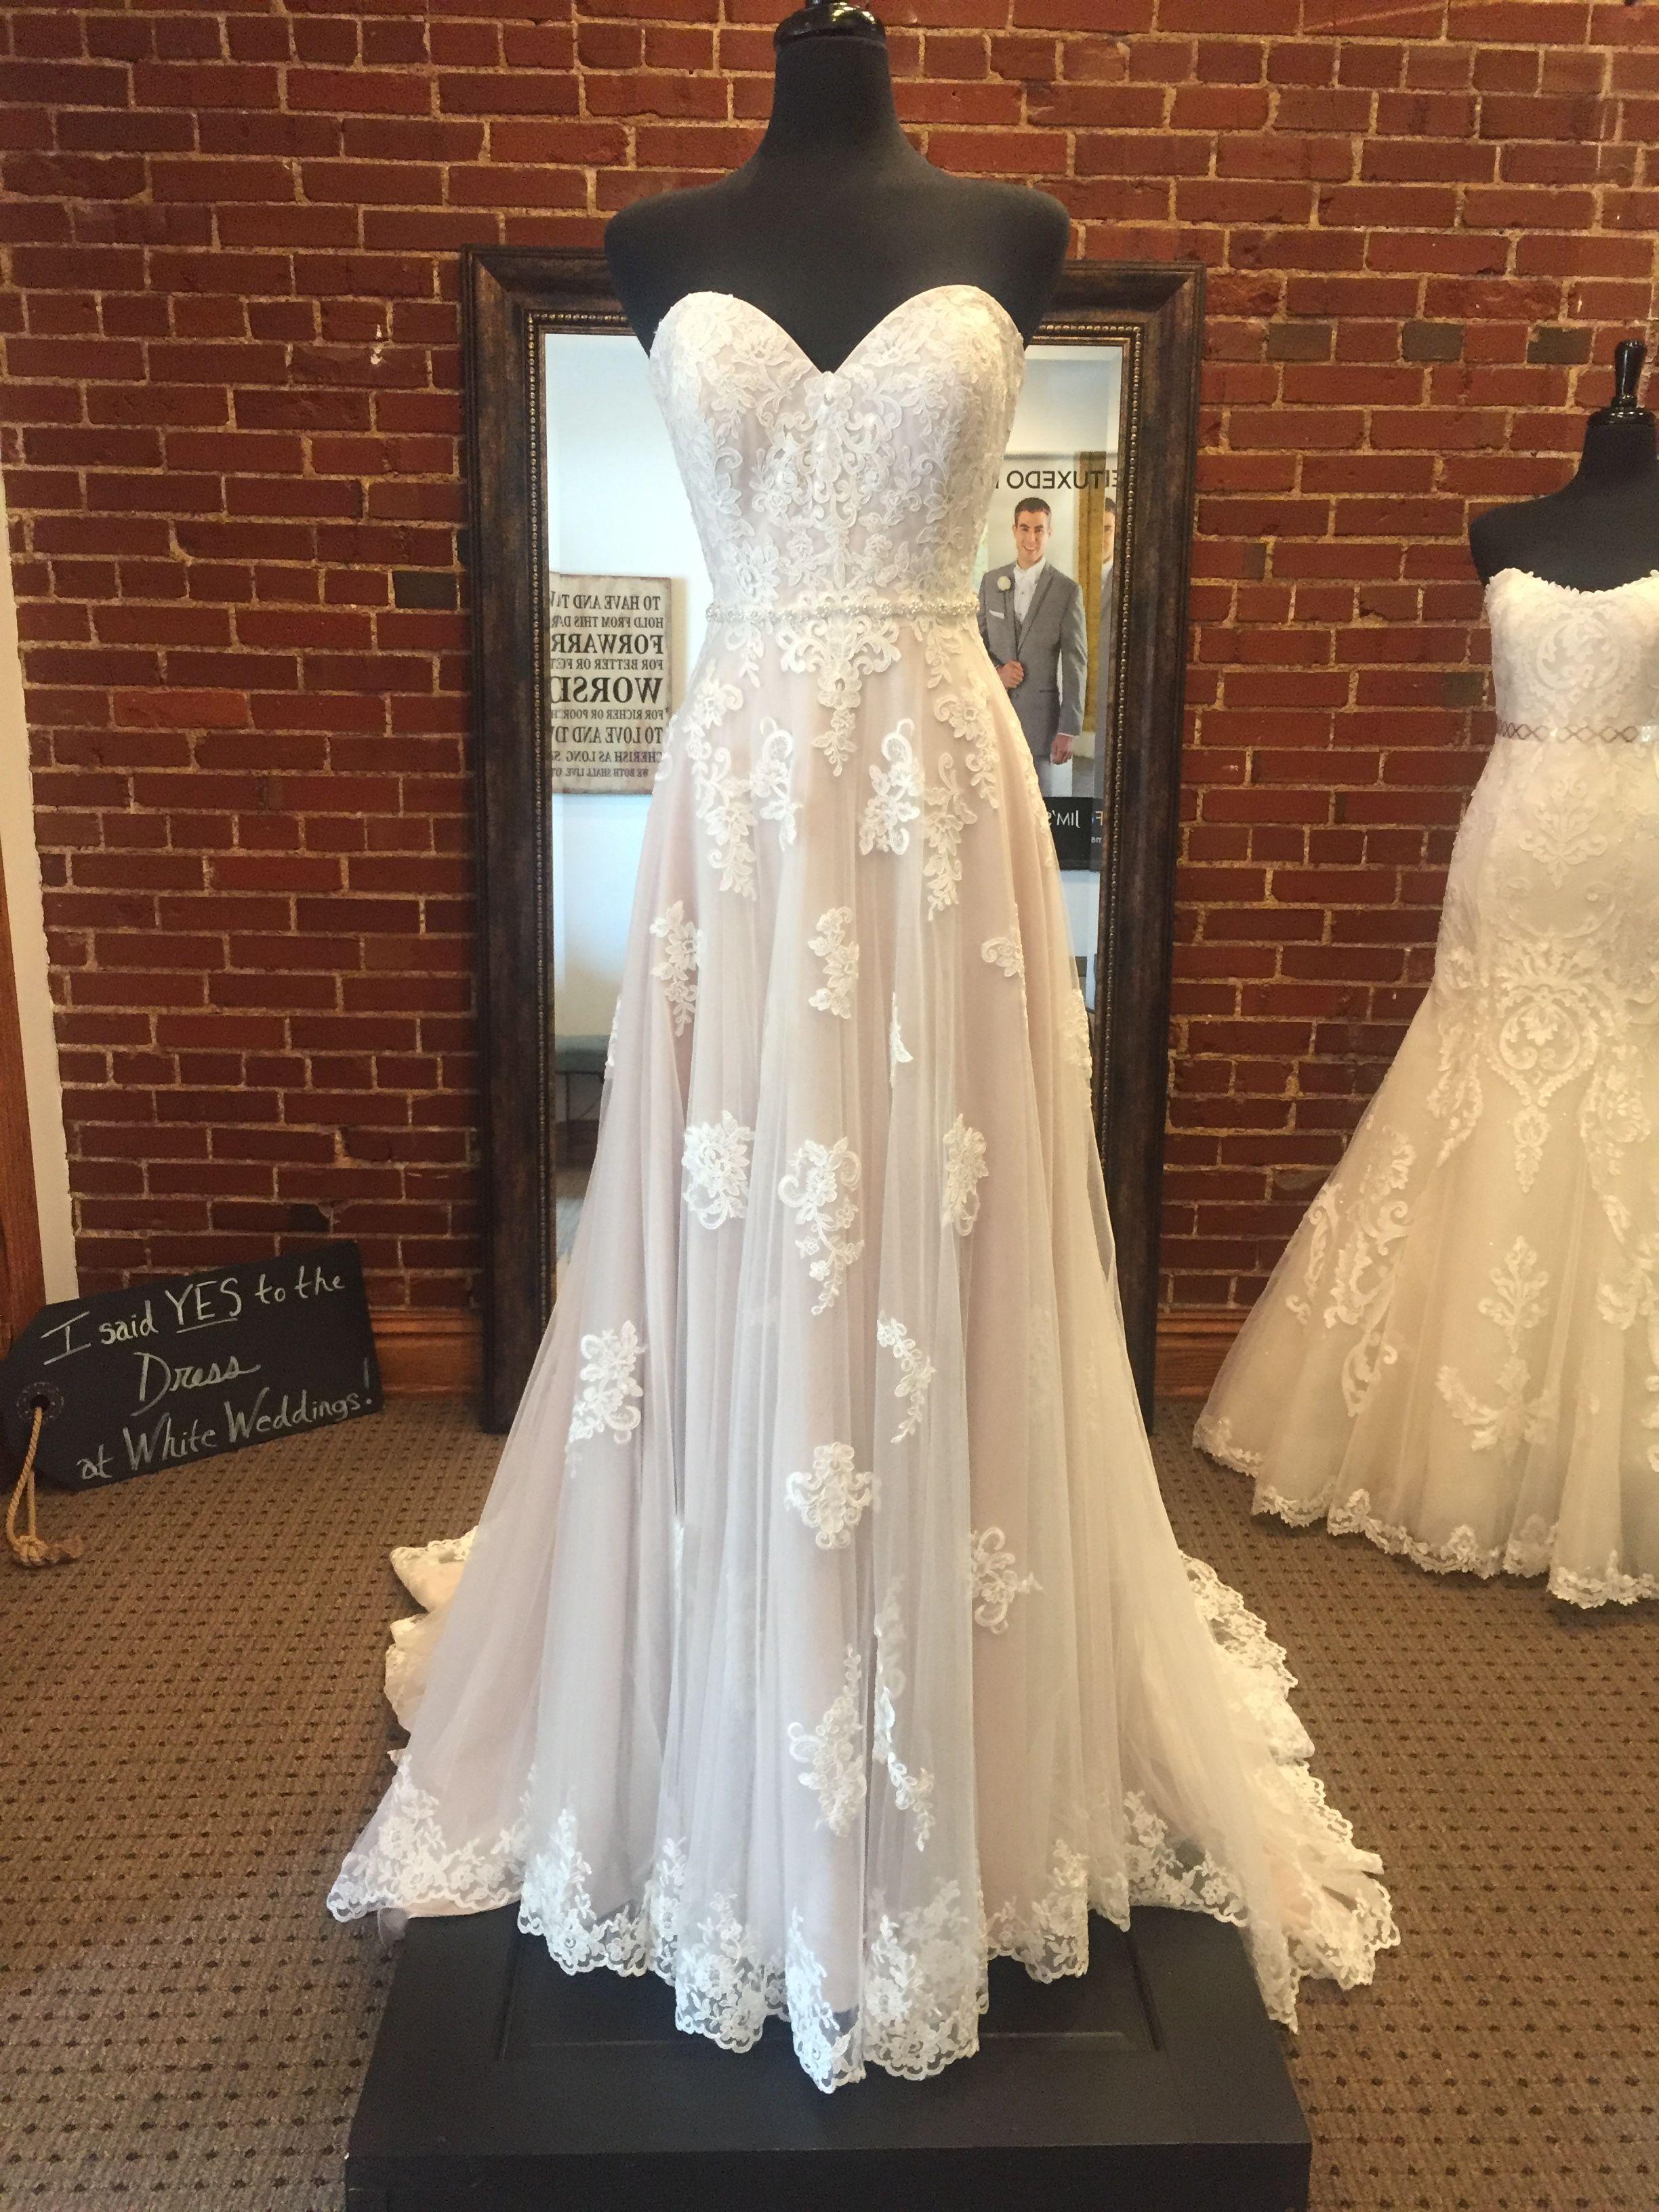 Tulle skirt wedding dress  Light and airy boho wedding dress by Stella York Lace appliqués